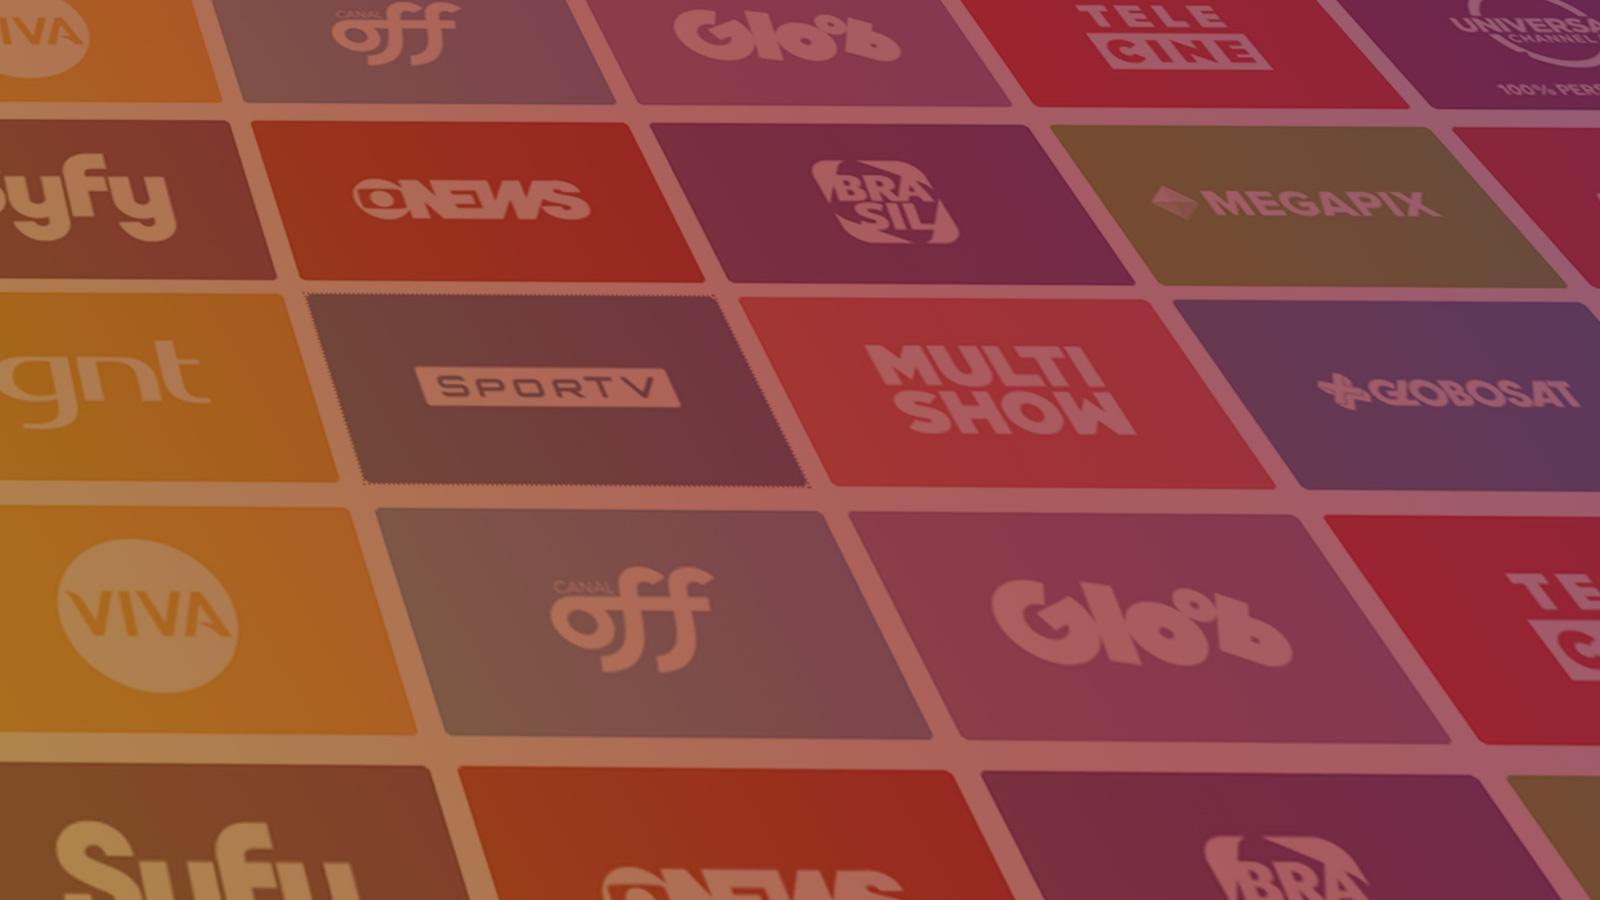 Globosat Play - Saiba como assinar